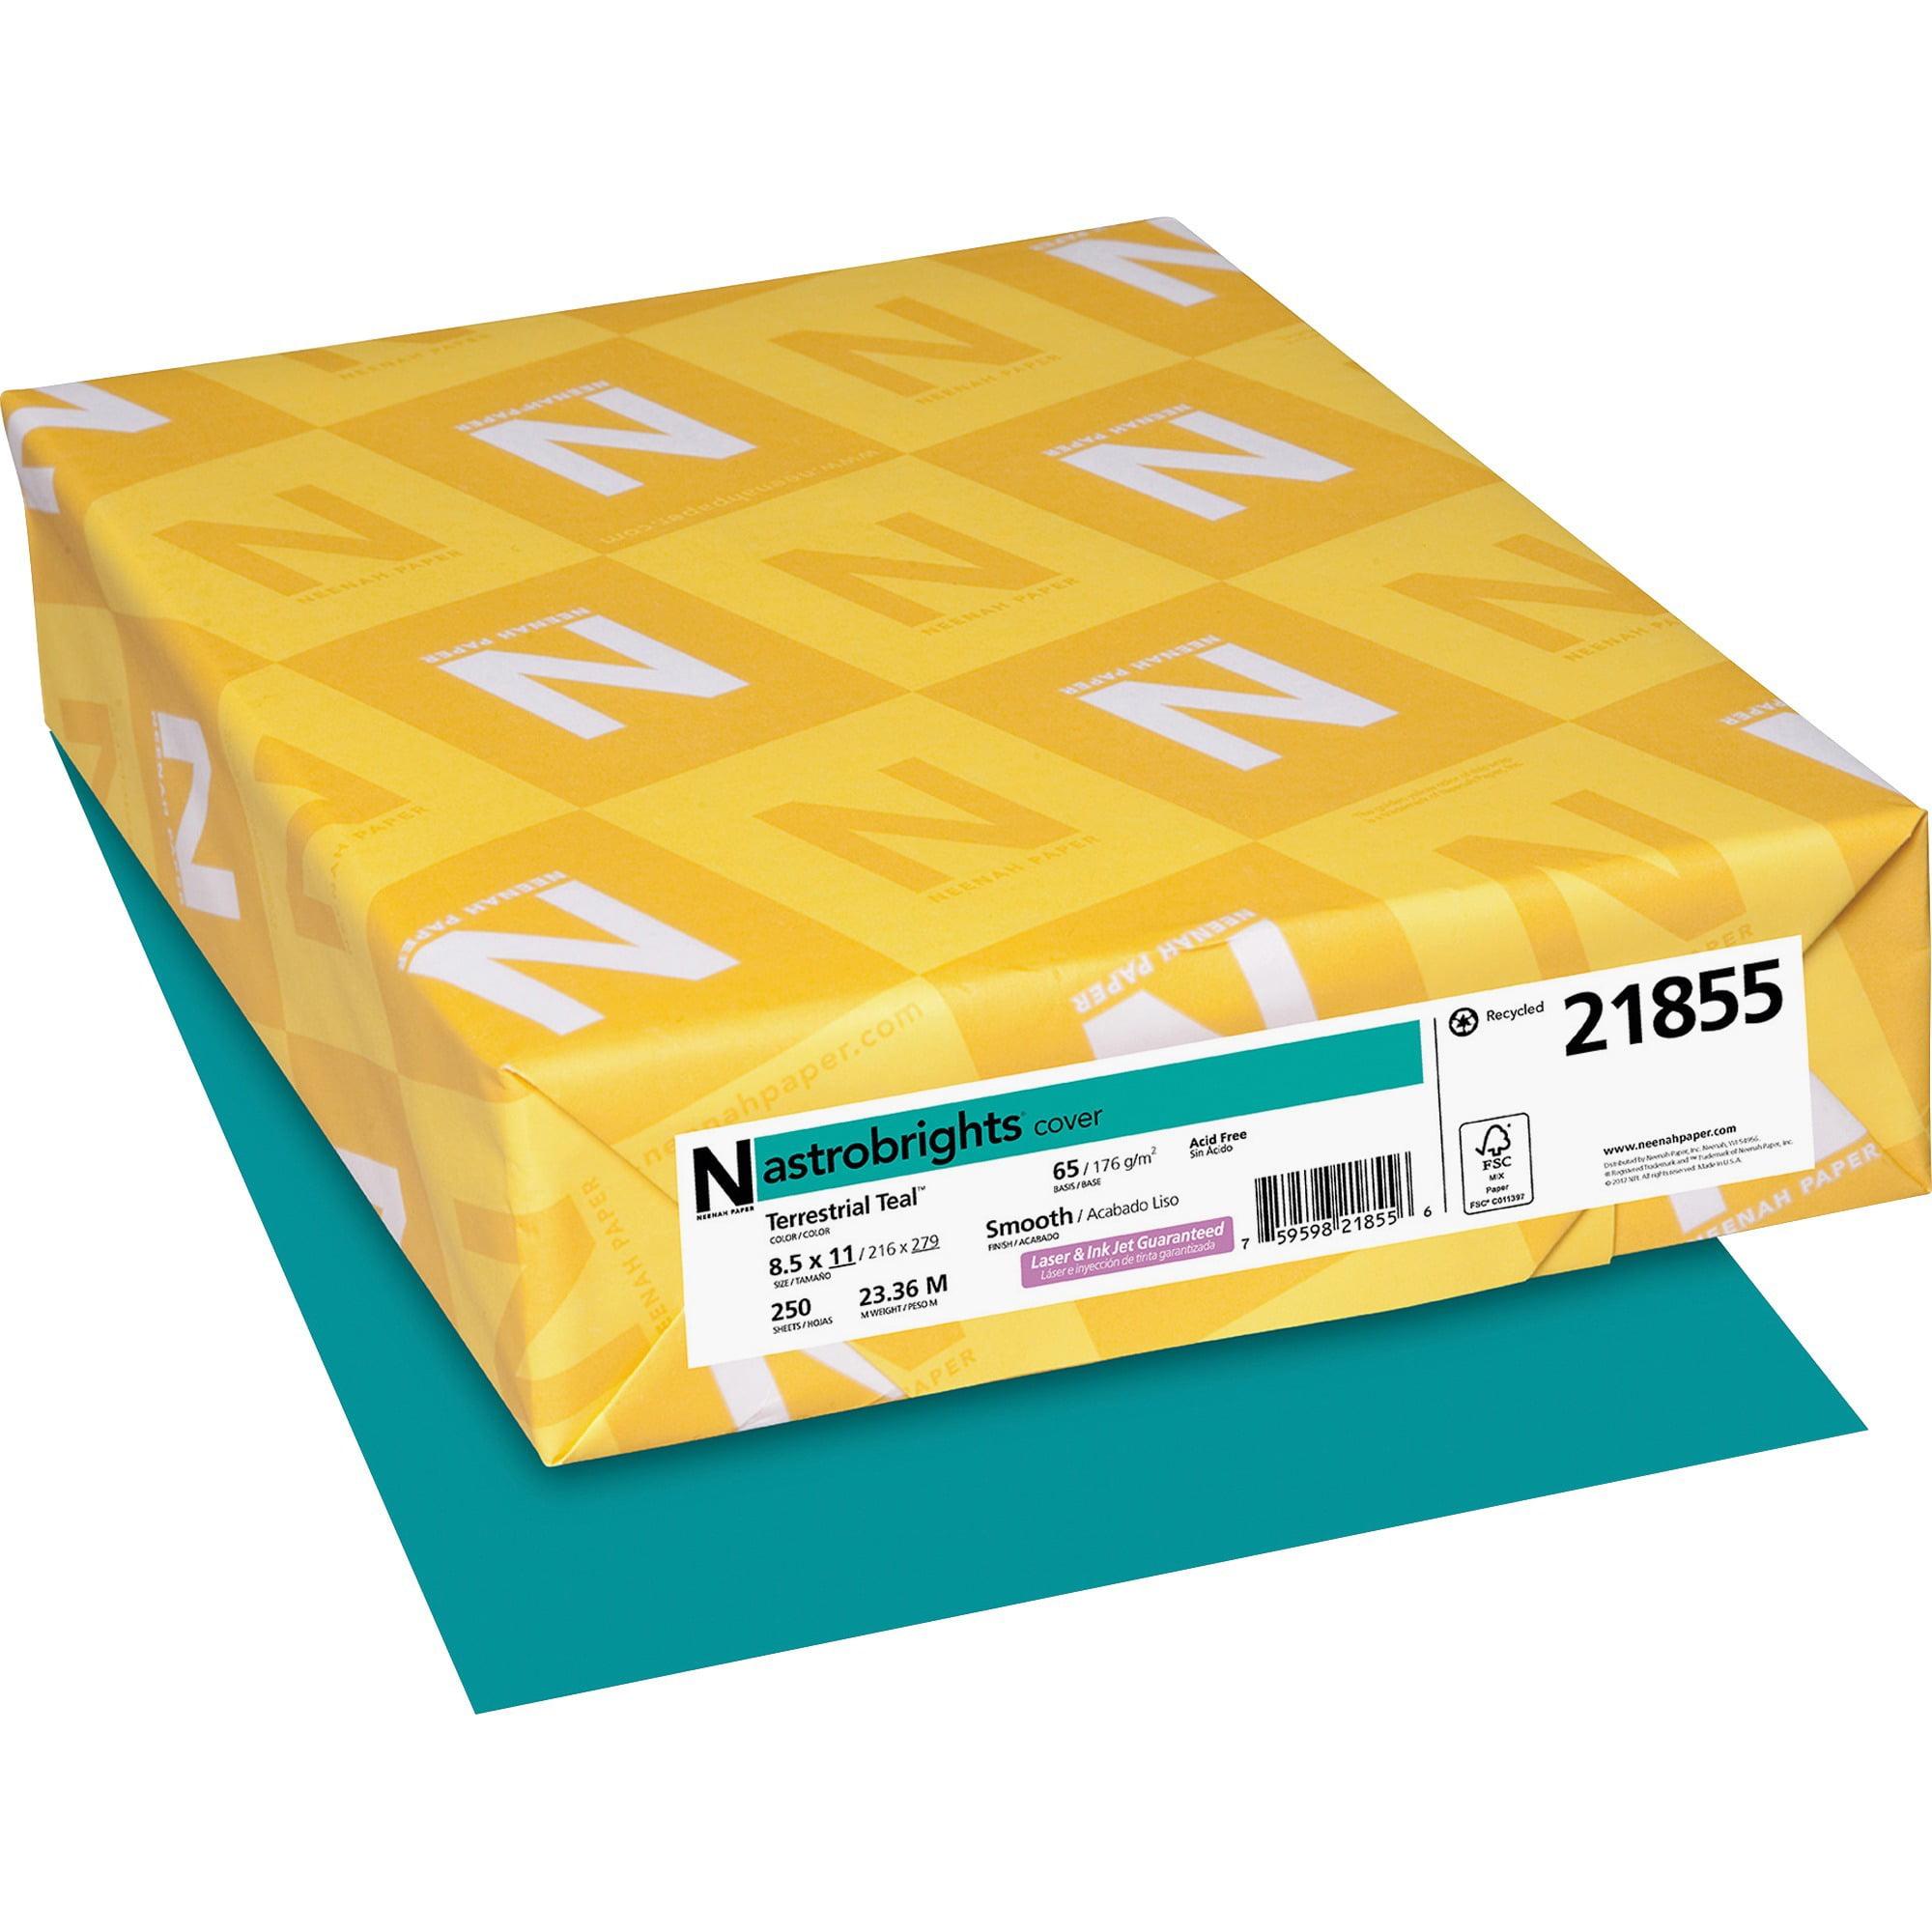 Astrobrights, WAU21855, Colored Cardstock, 250 / Pack, Terrestrial Teal